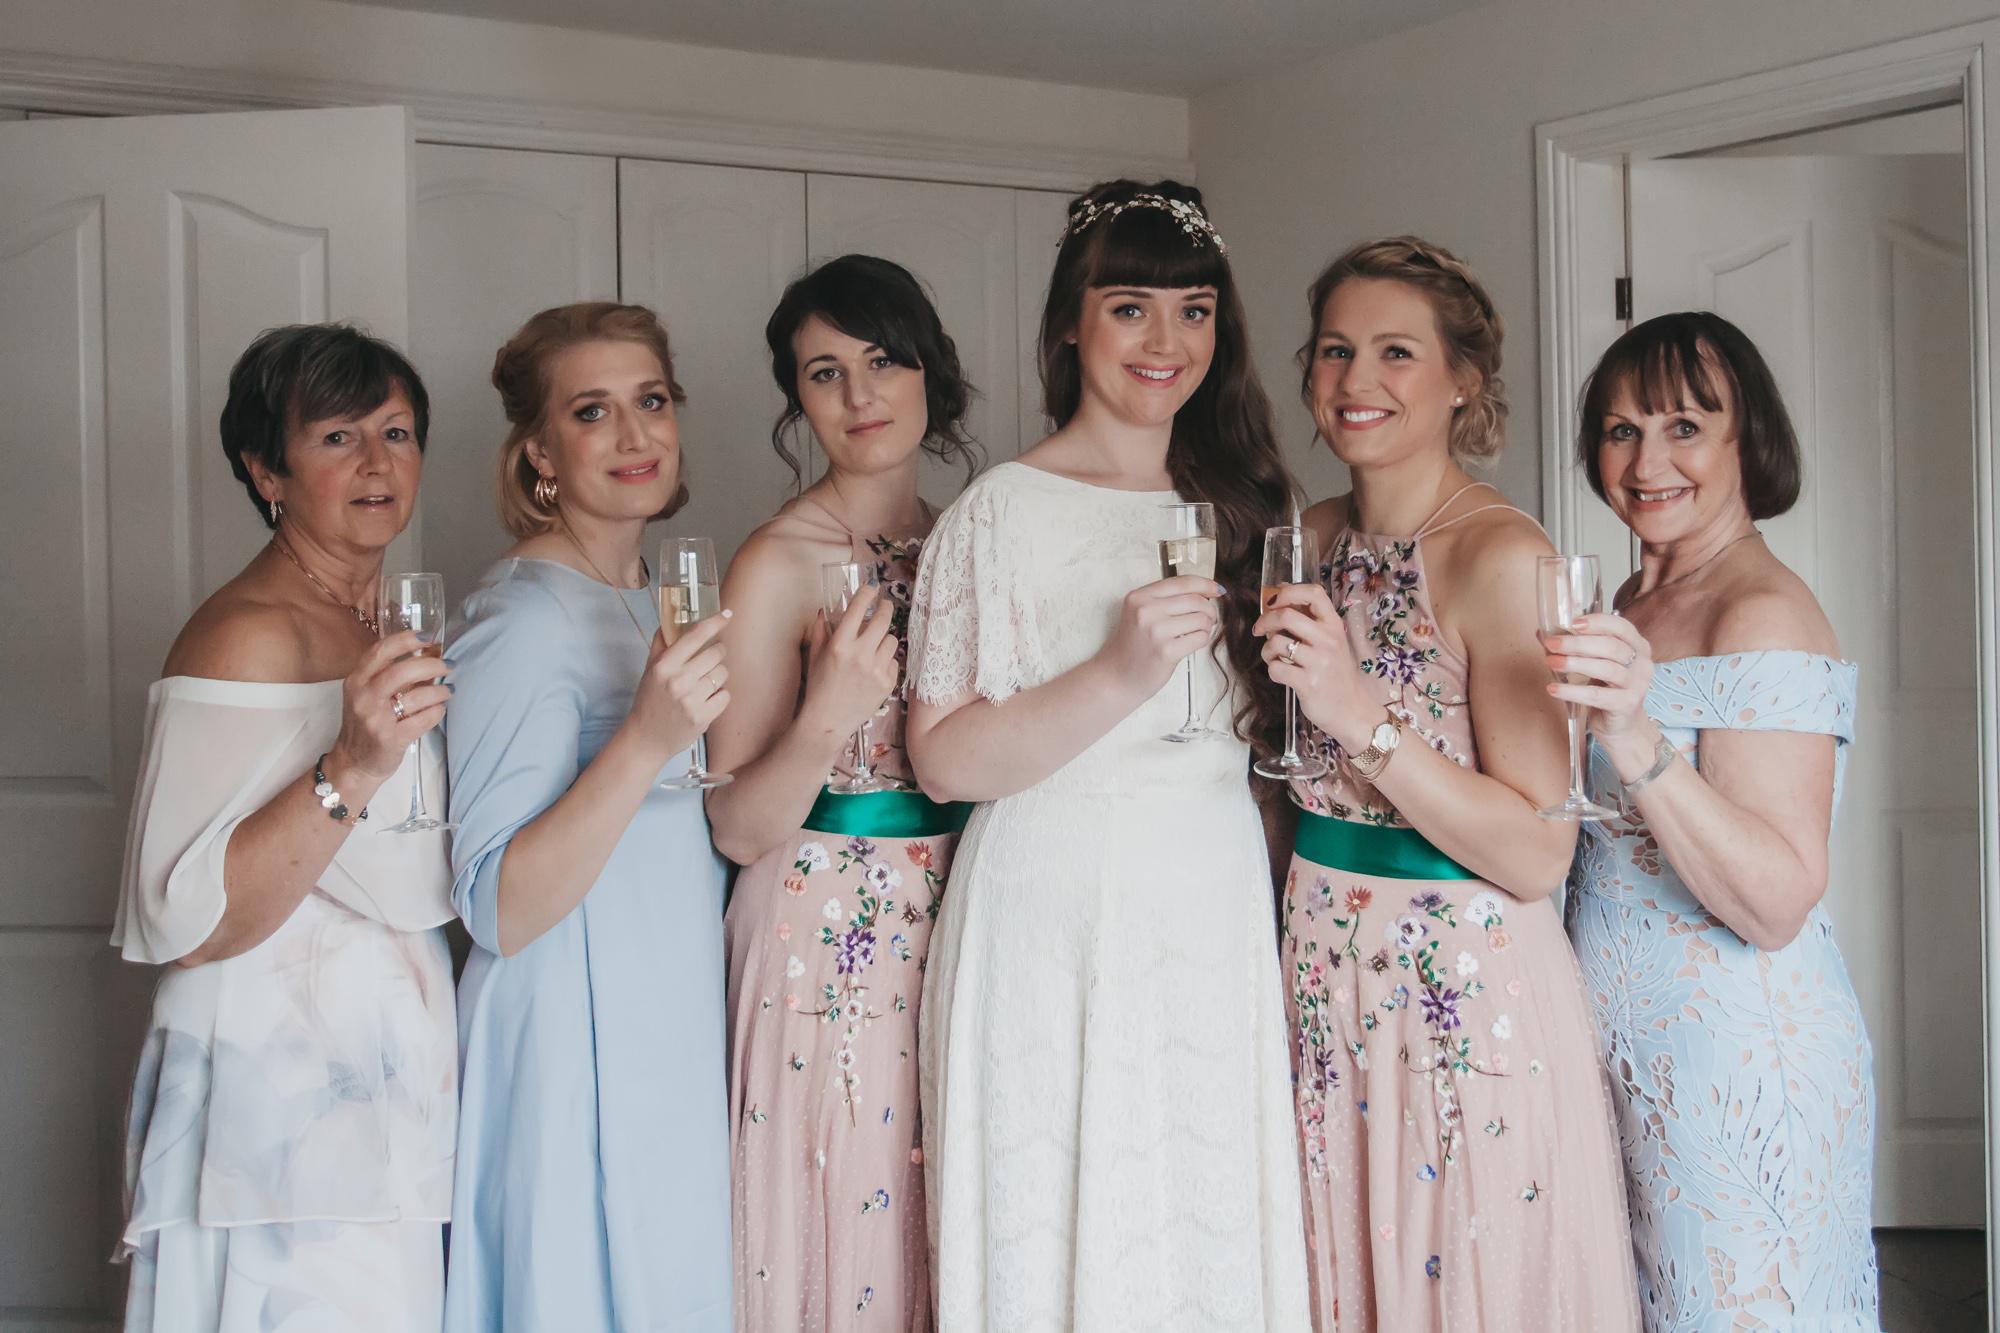 Kristy-Back-Garden-Outdoor-Wedding-Sheffield-Industrial-Warehouse-Wedding-Bohemian-Kate-Beaumont-Dahlia-Dress-4.jpg